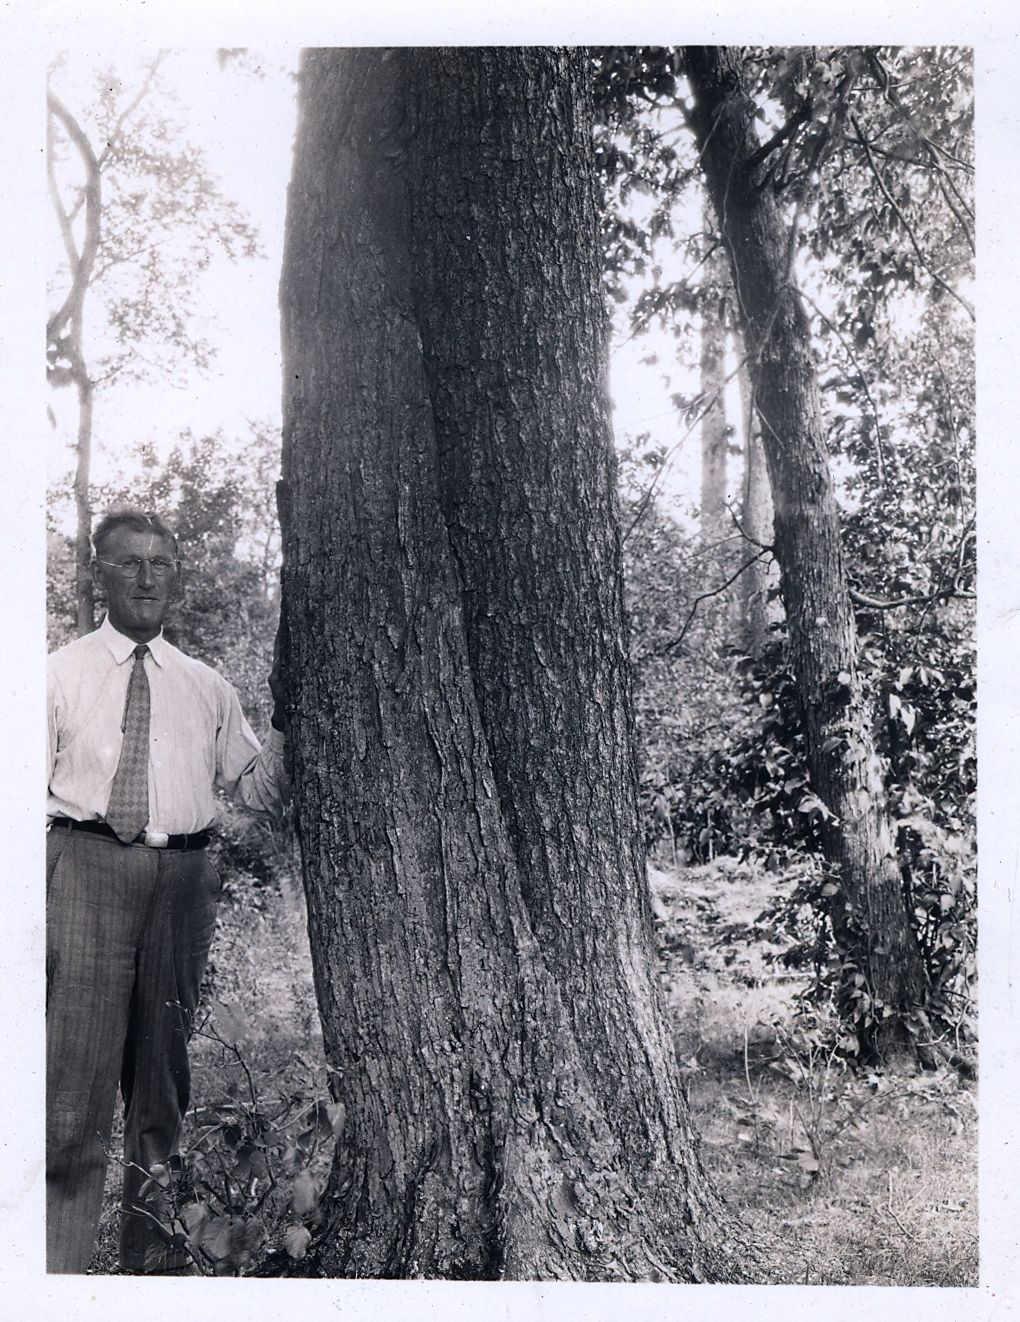 Frank Schantz and a double tree